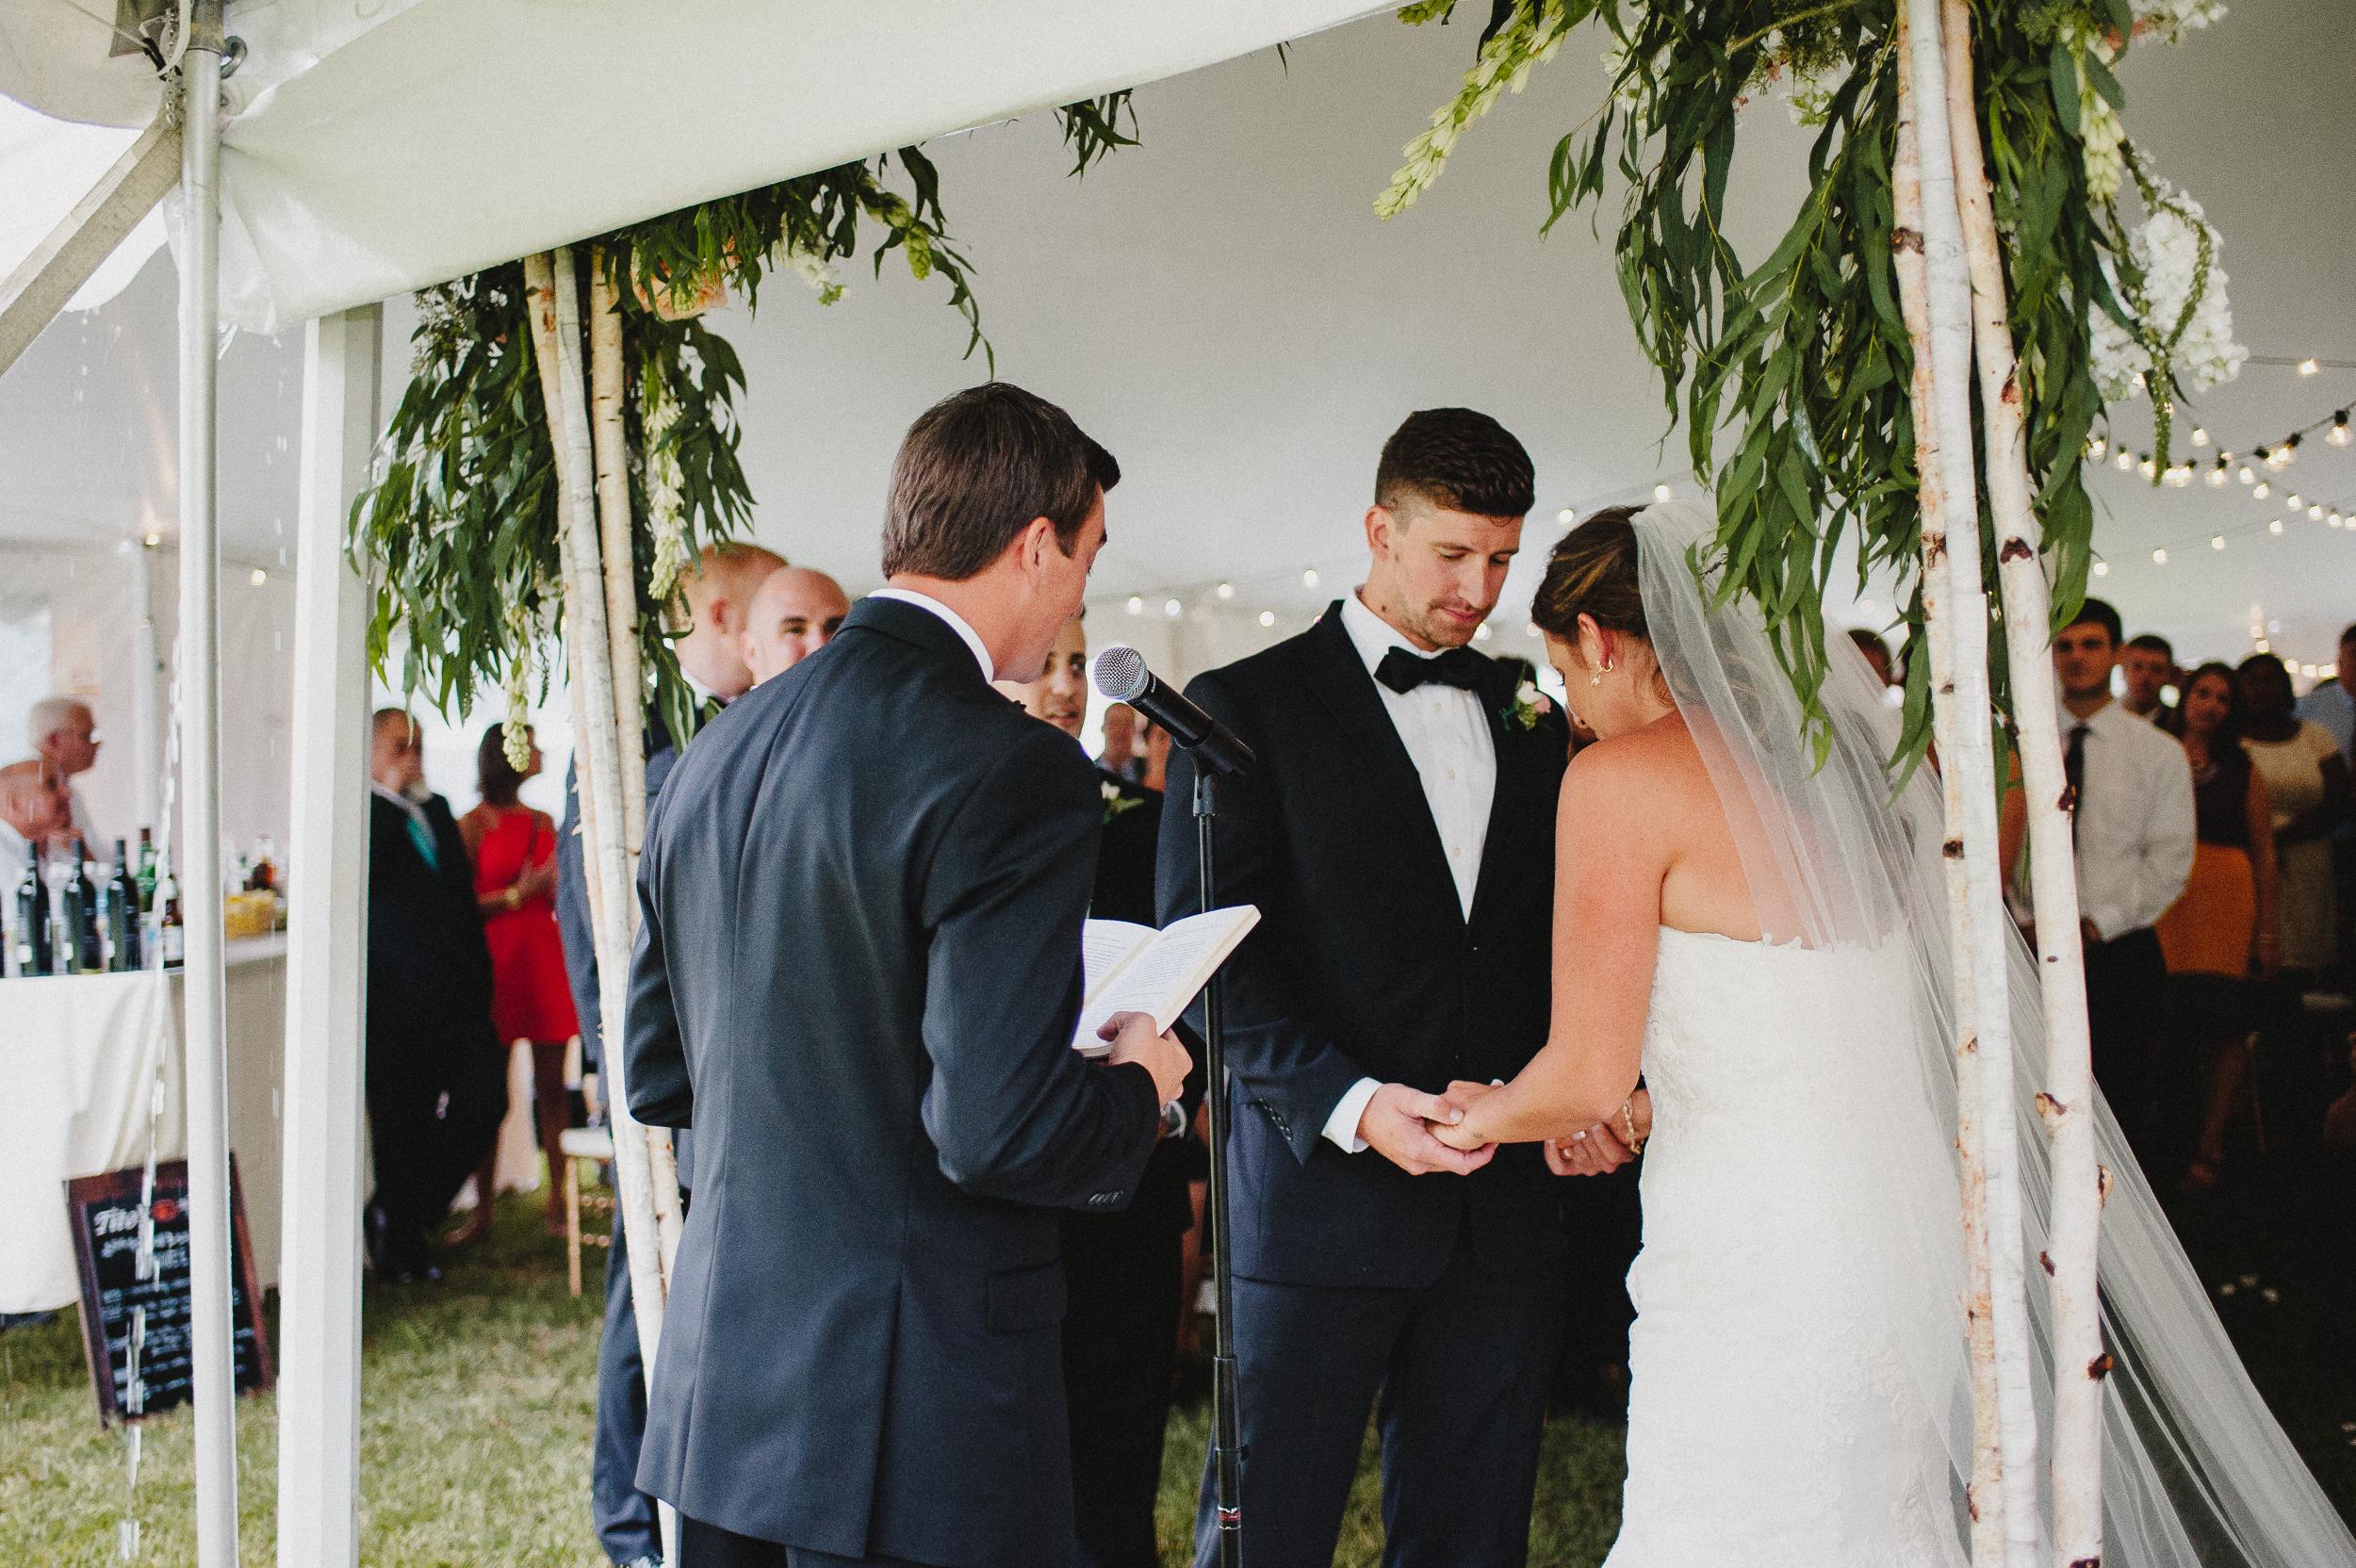 delaware-estate-wedding-photographer-pat-robinson-photography-89.jpg